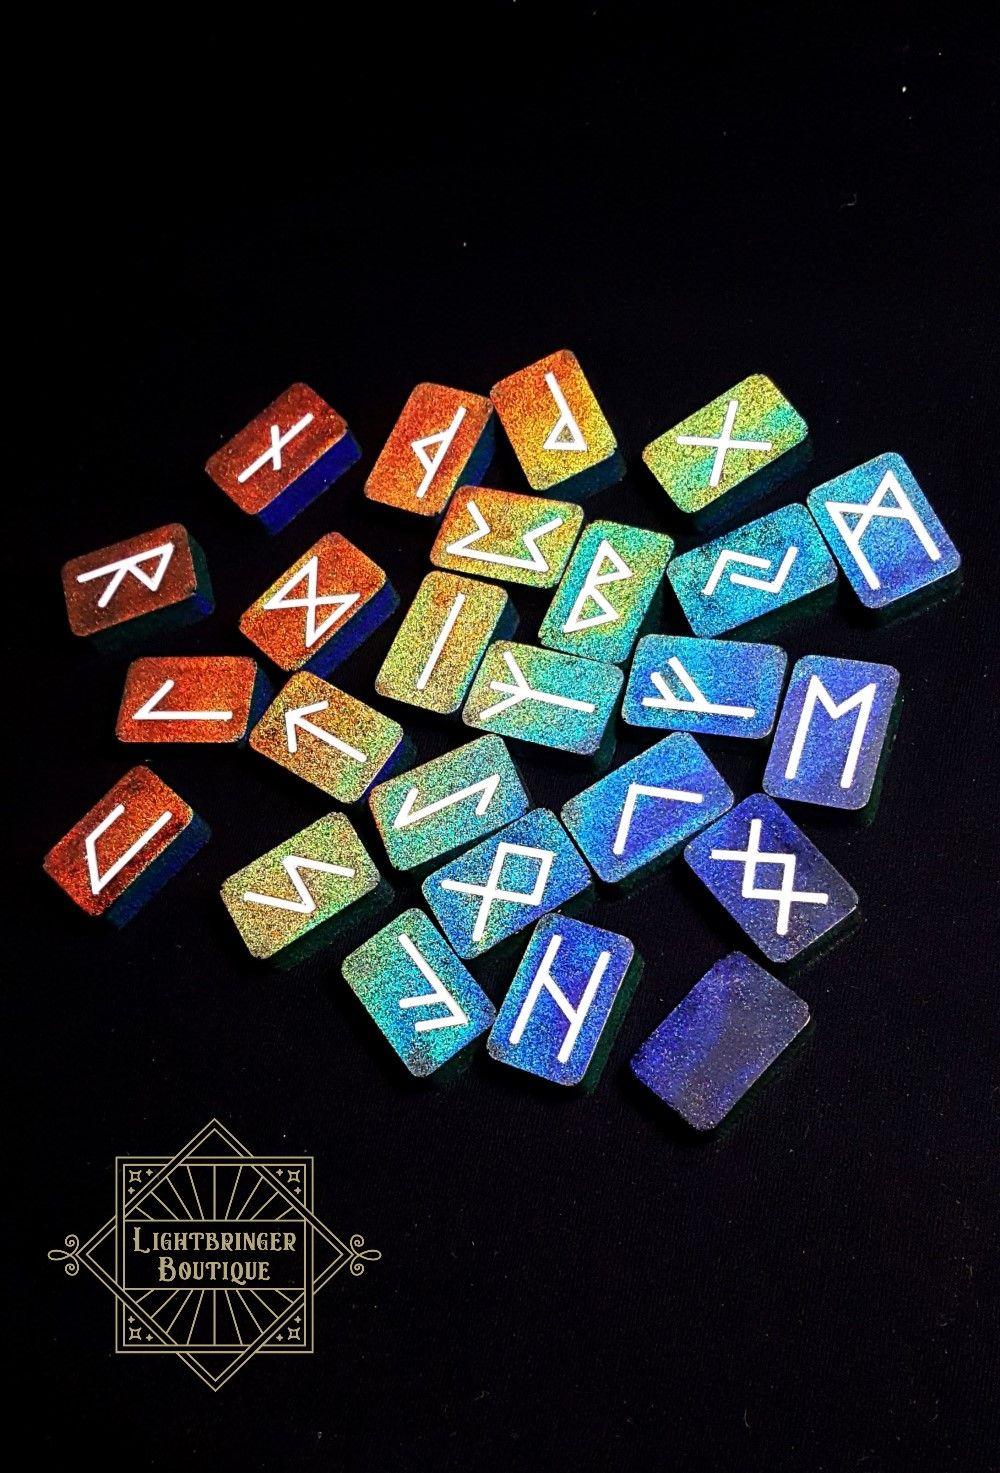 Holographic Rune Stones Runes Rune Stones Rune Symbols